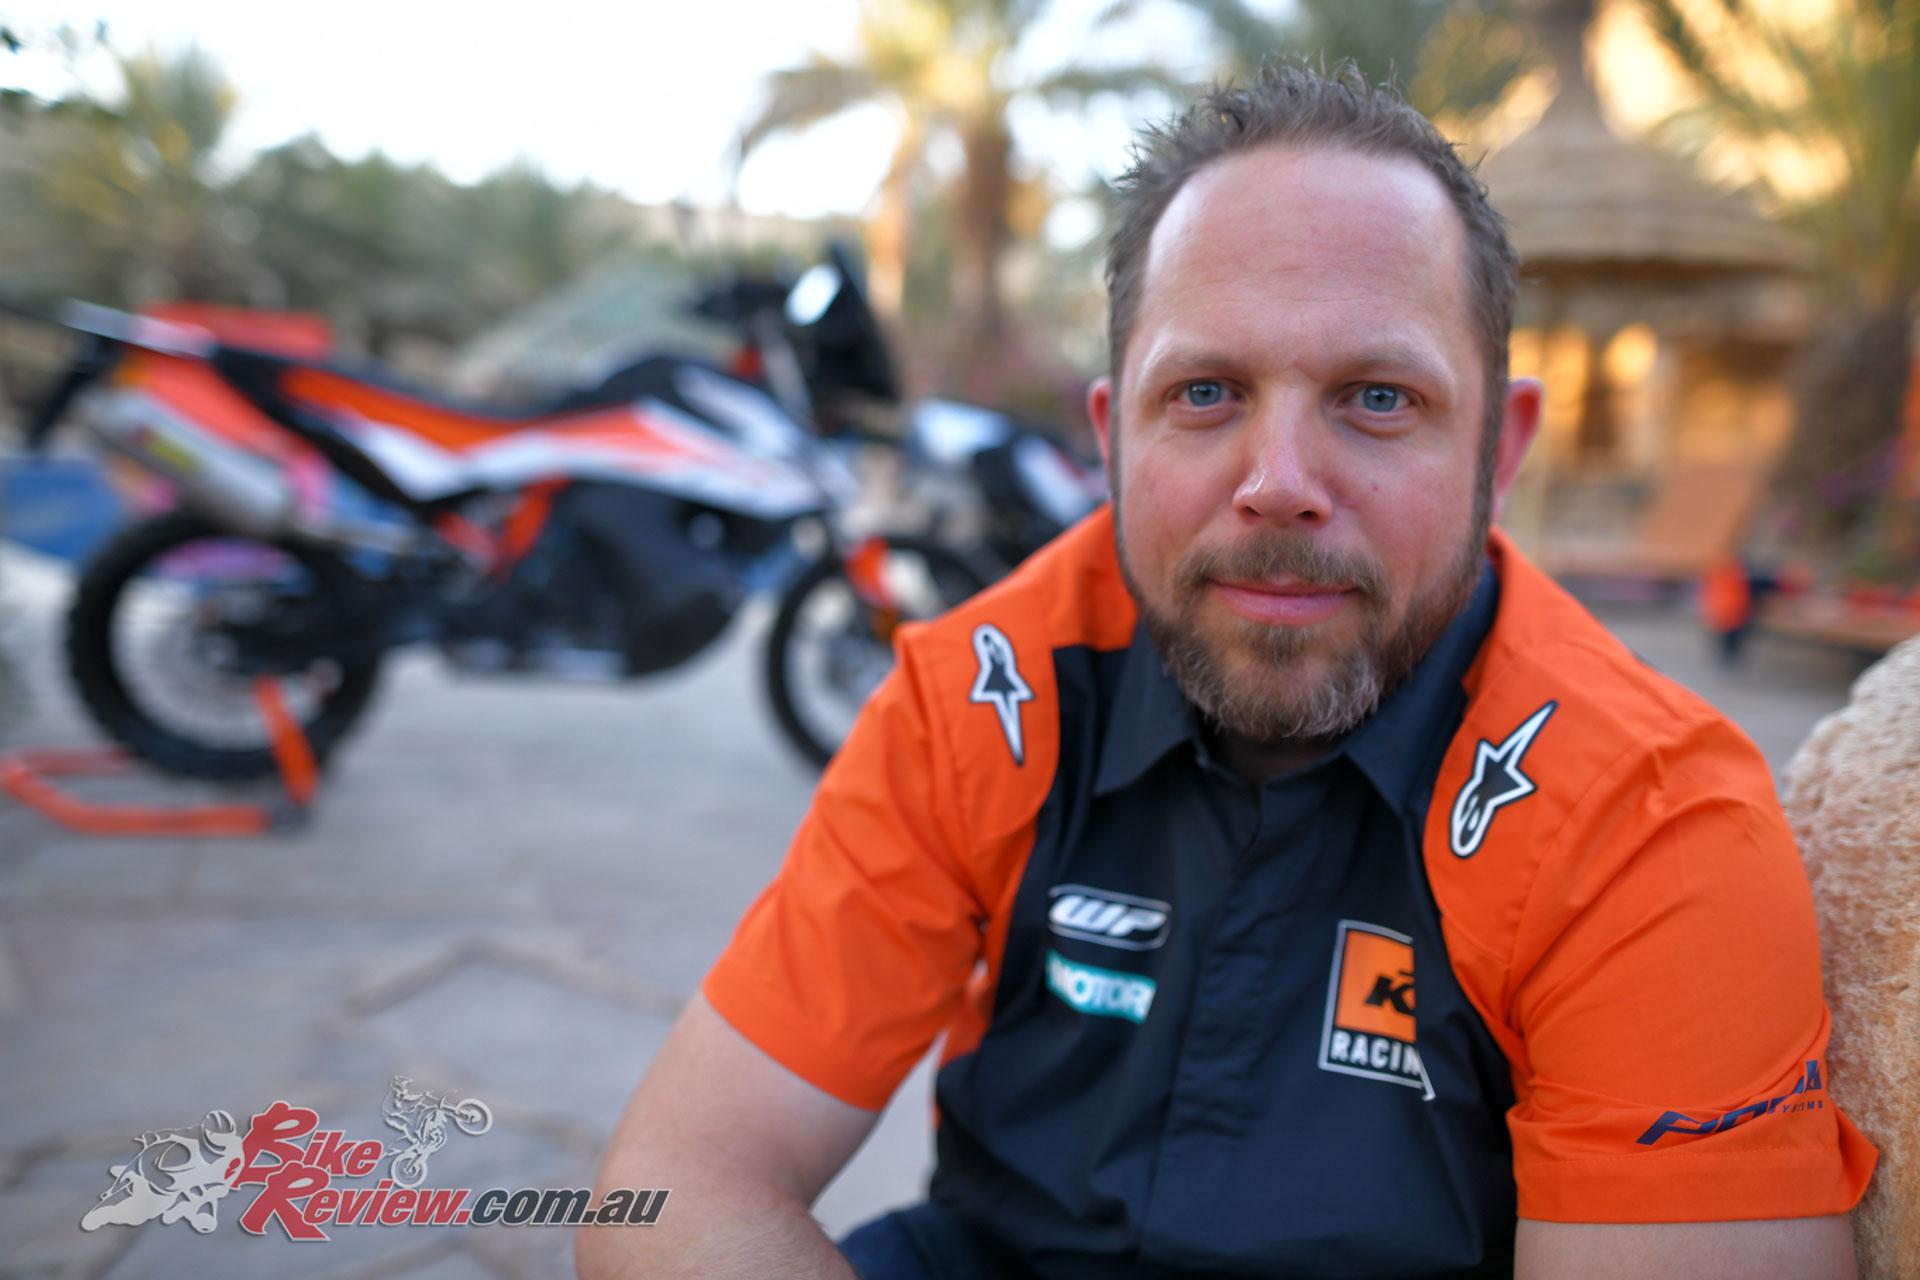 Adriaan Sinke - KTM Senior Product Manager Mid-Capacity